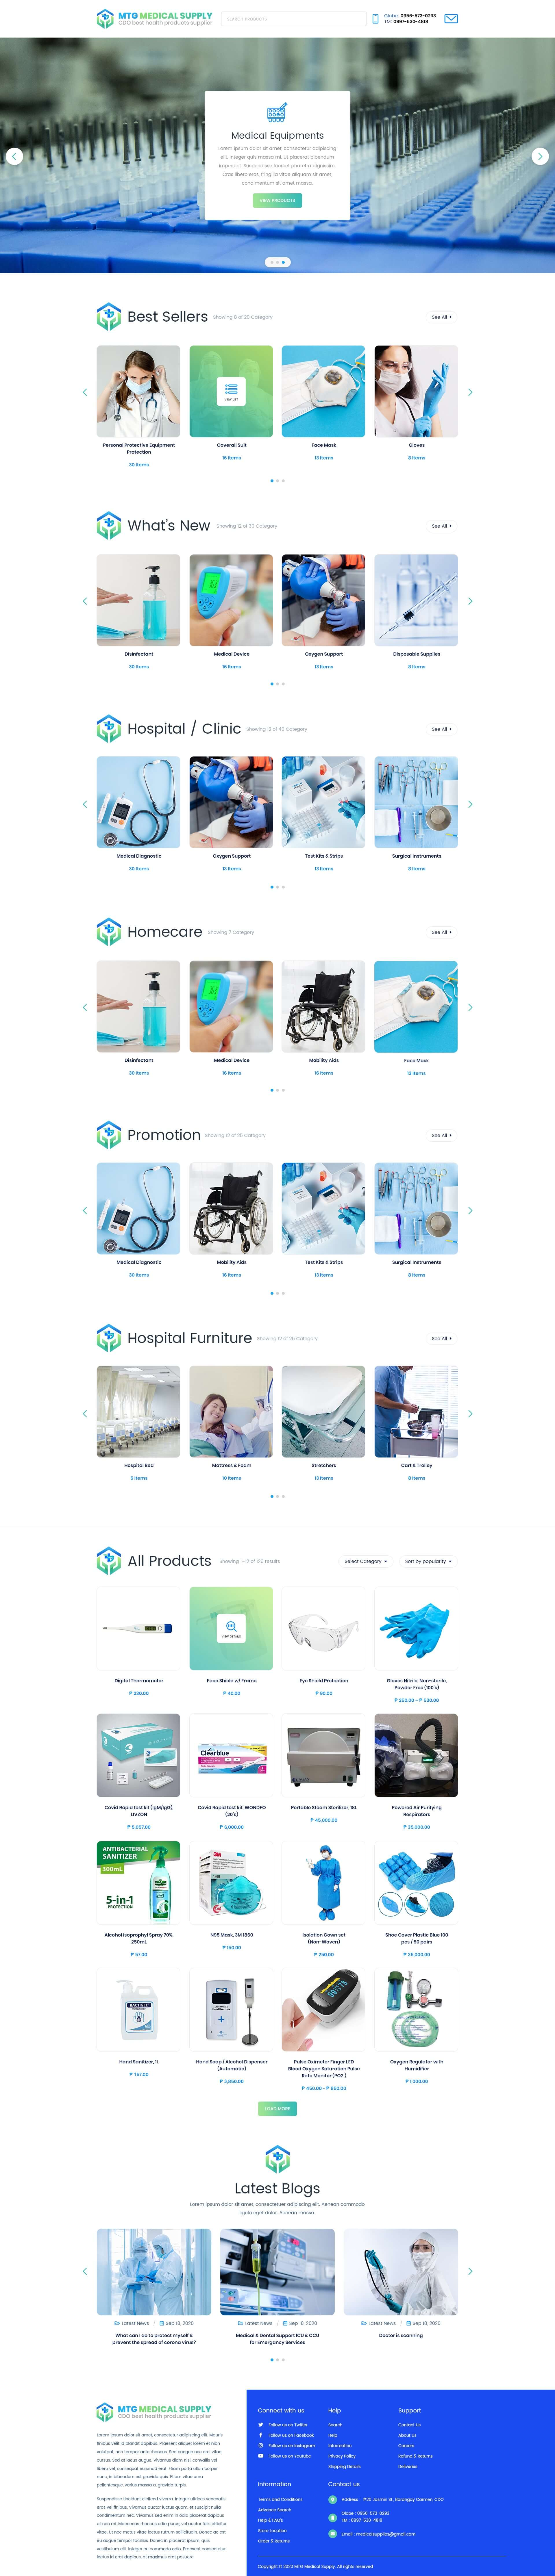 MTG Medical Supply